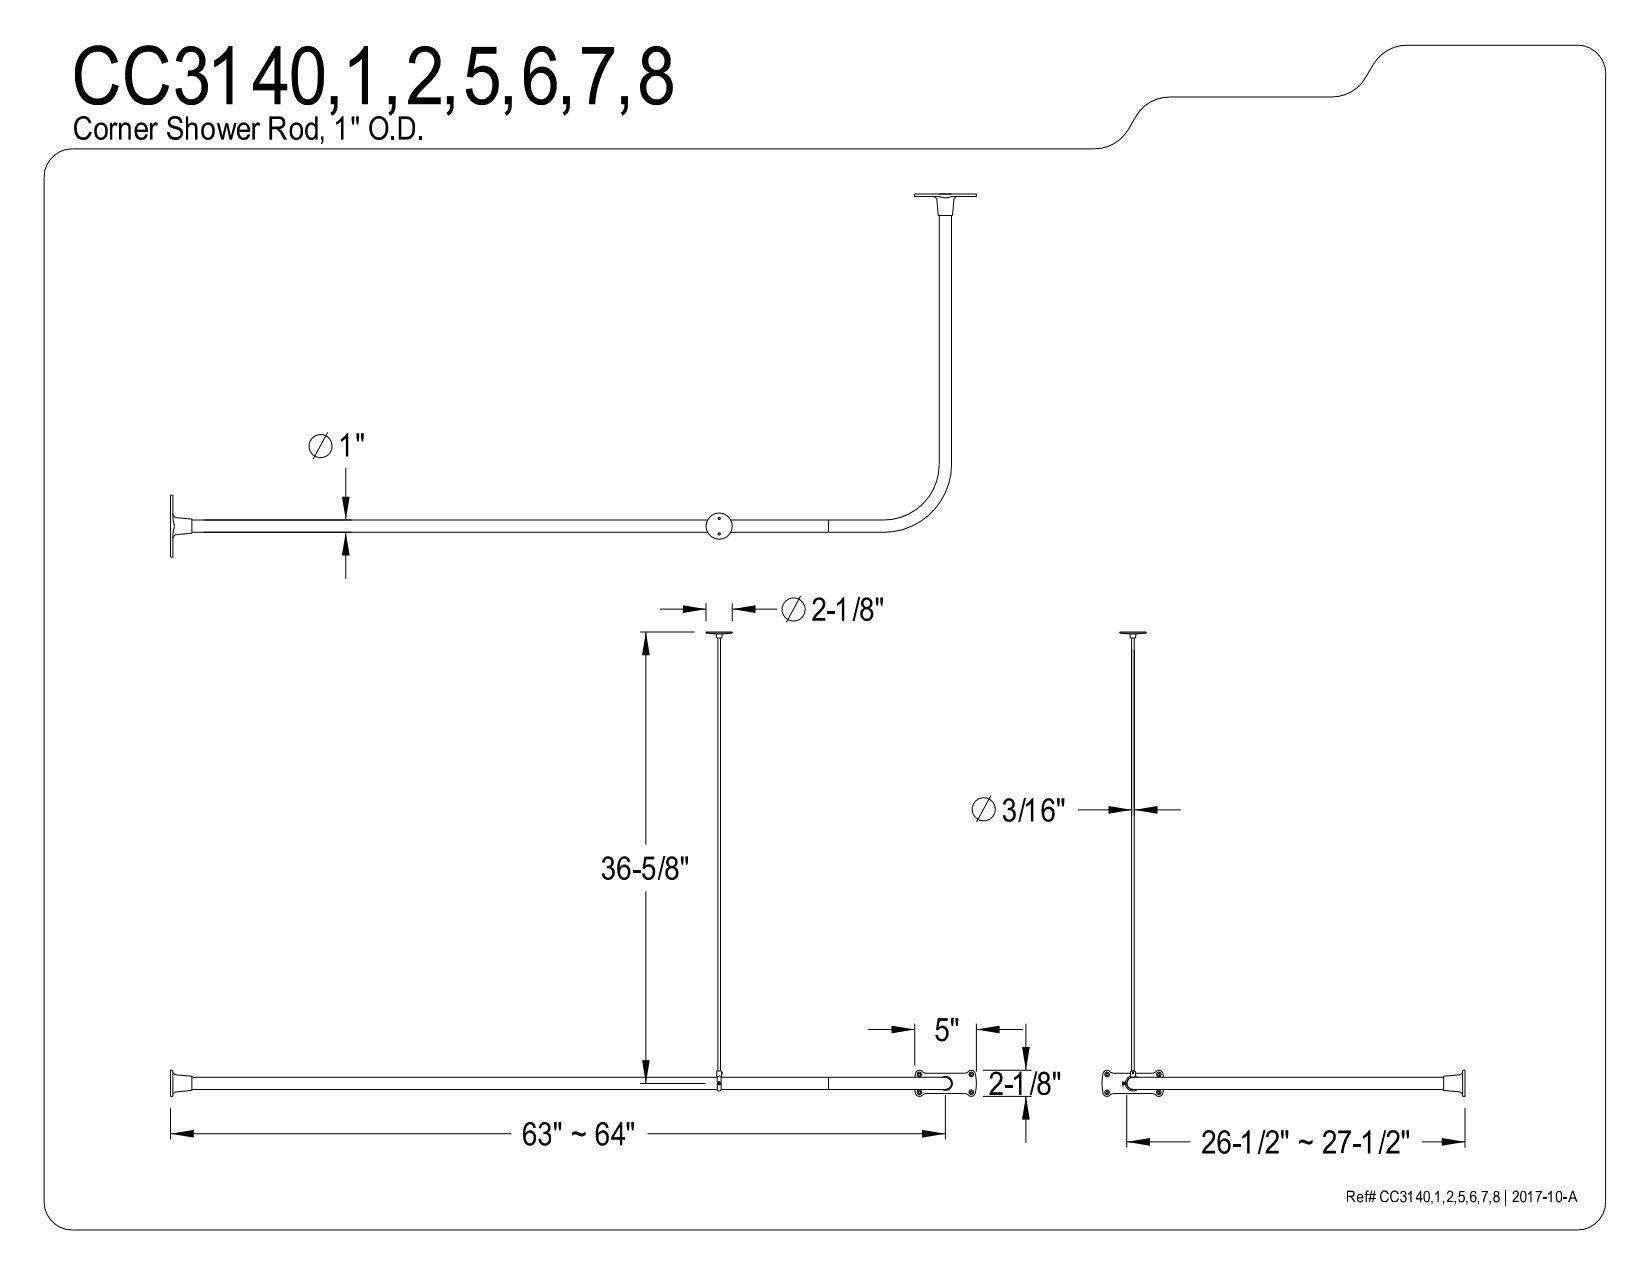 Kingston Brass CC3141 63-Inch Large Size by 26-1/2-Inch Corner Shower Rod, Polished Chrome by Kingston Brass (Image #1)